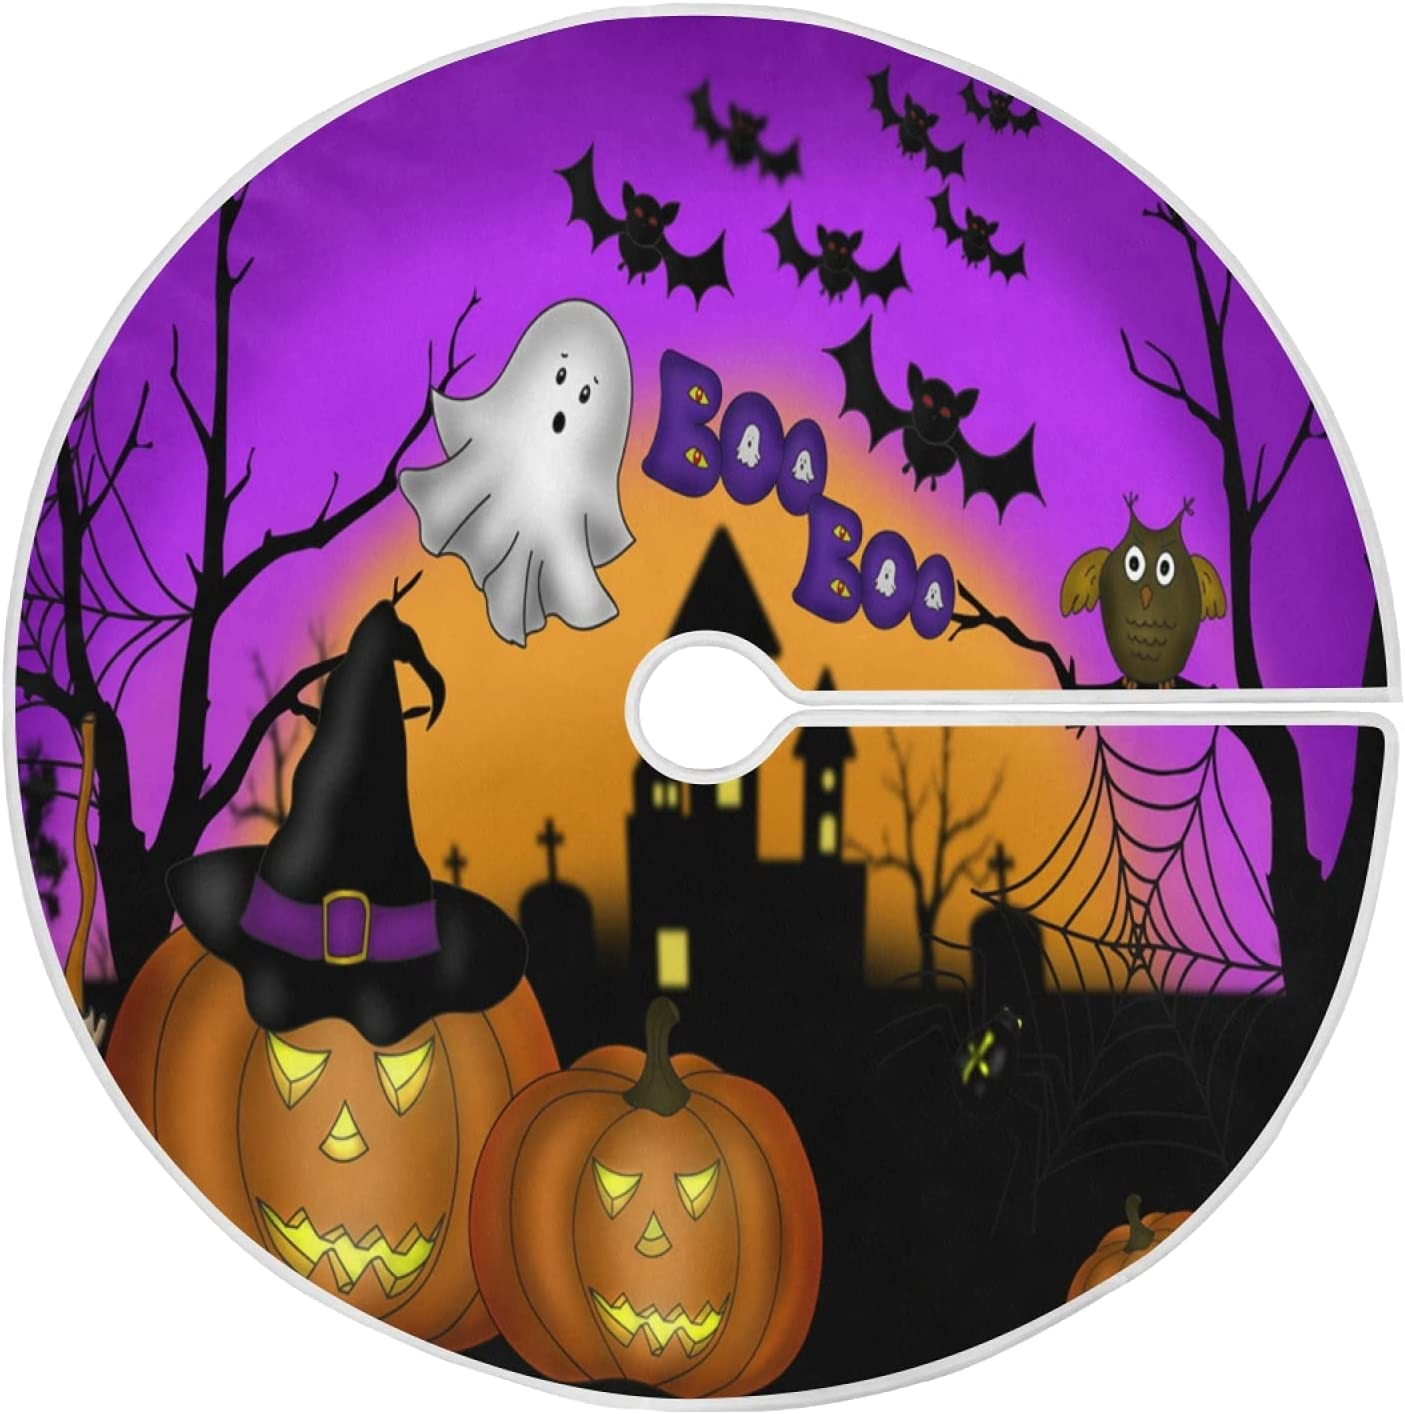 Halloween Tree Skirt Pumpkin Christmas Scary Max 64% OFF 5 popular Ghost Ni